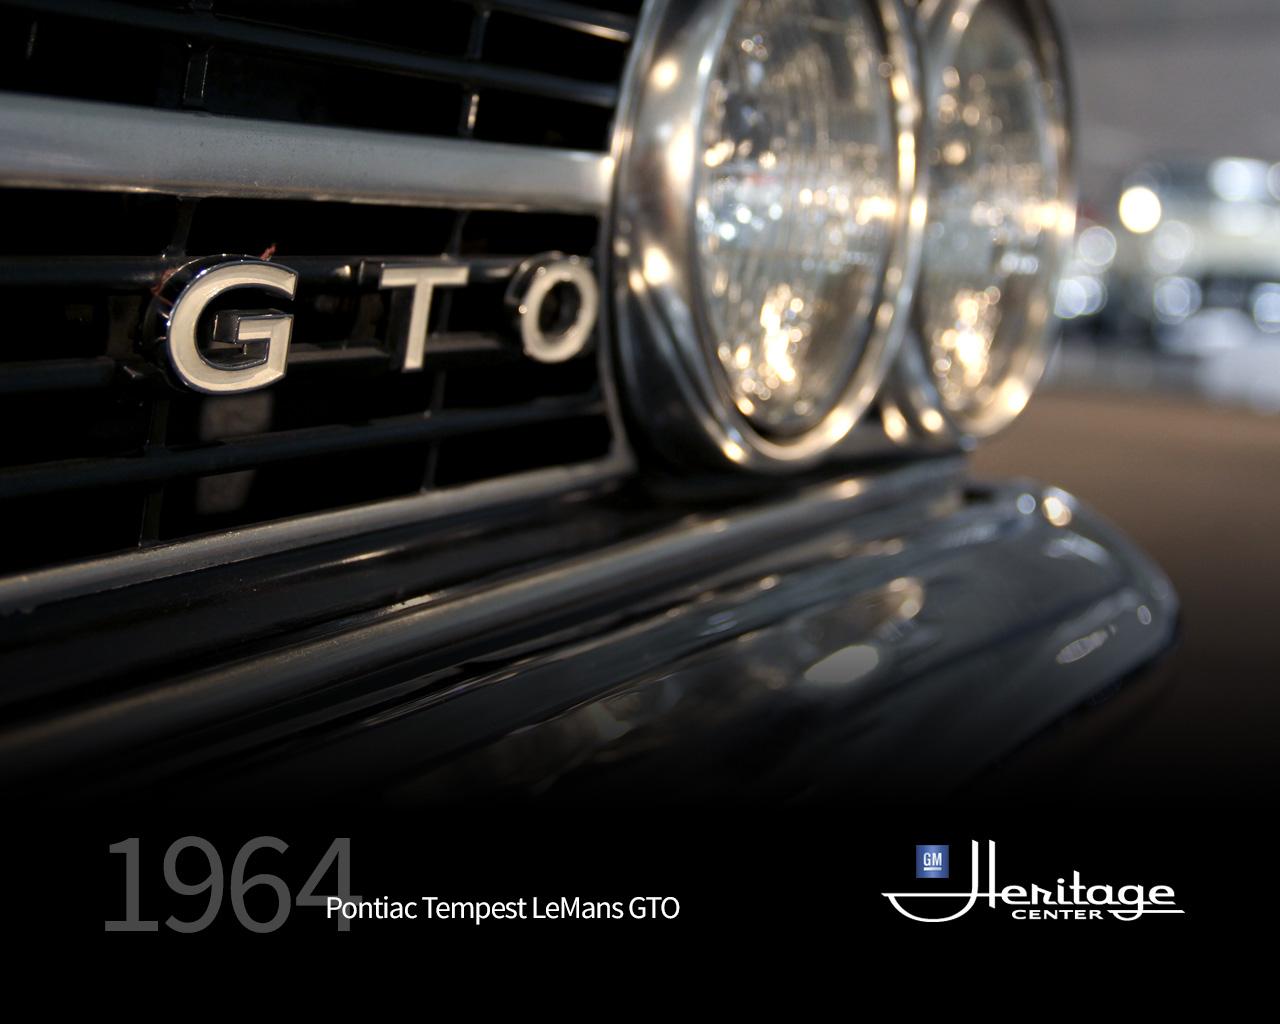 GTO badge detail